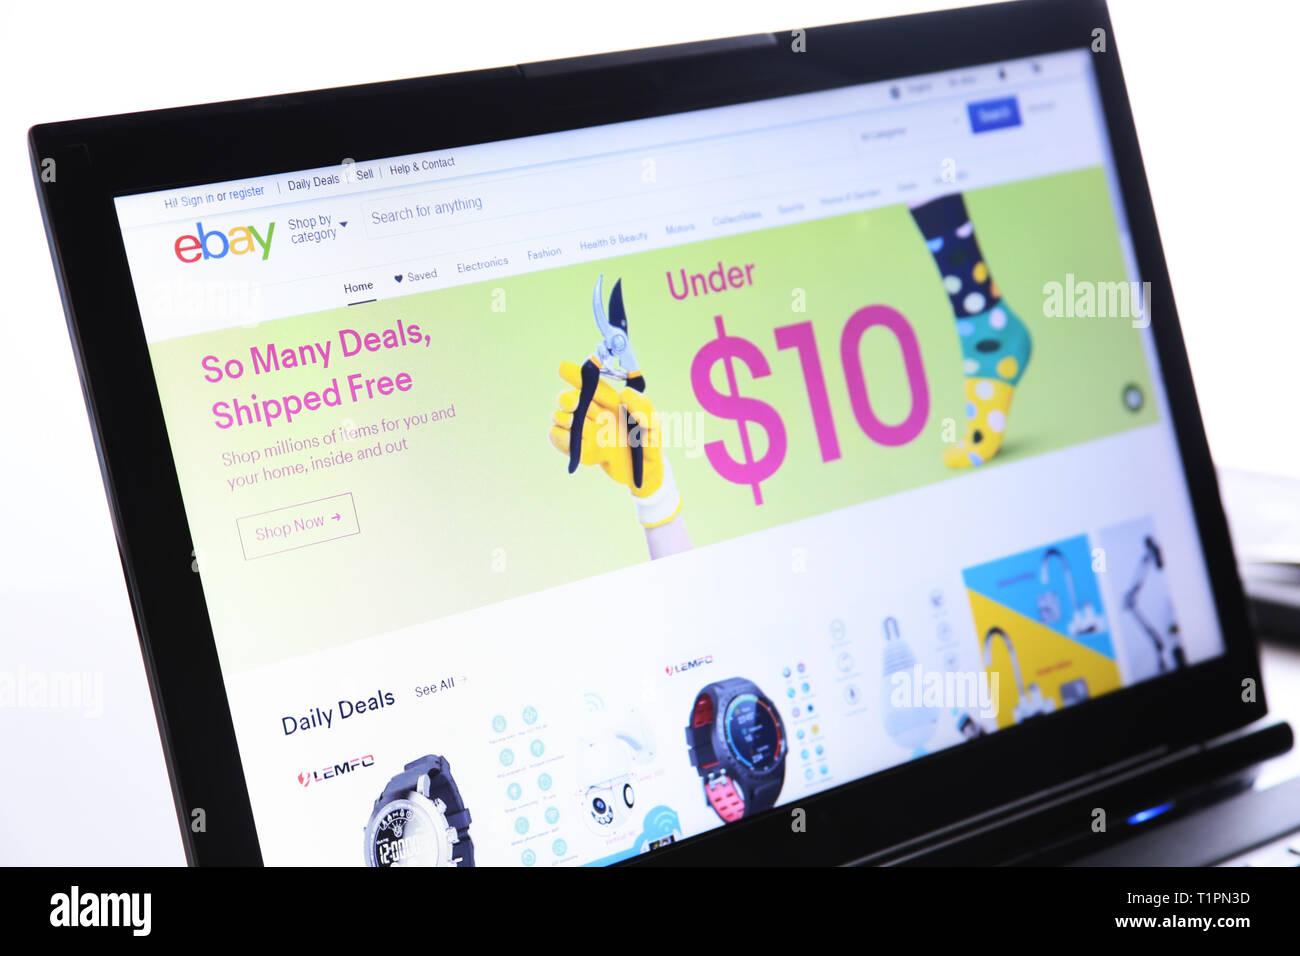 New York, USA - March 25, 2019: Illustrative Editorial of Website of eBay.com. eBay logo visible on display screen. - Stock Image